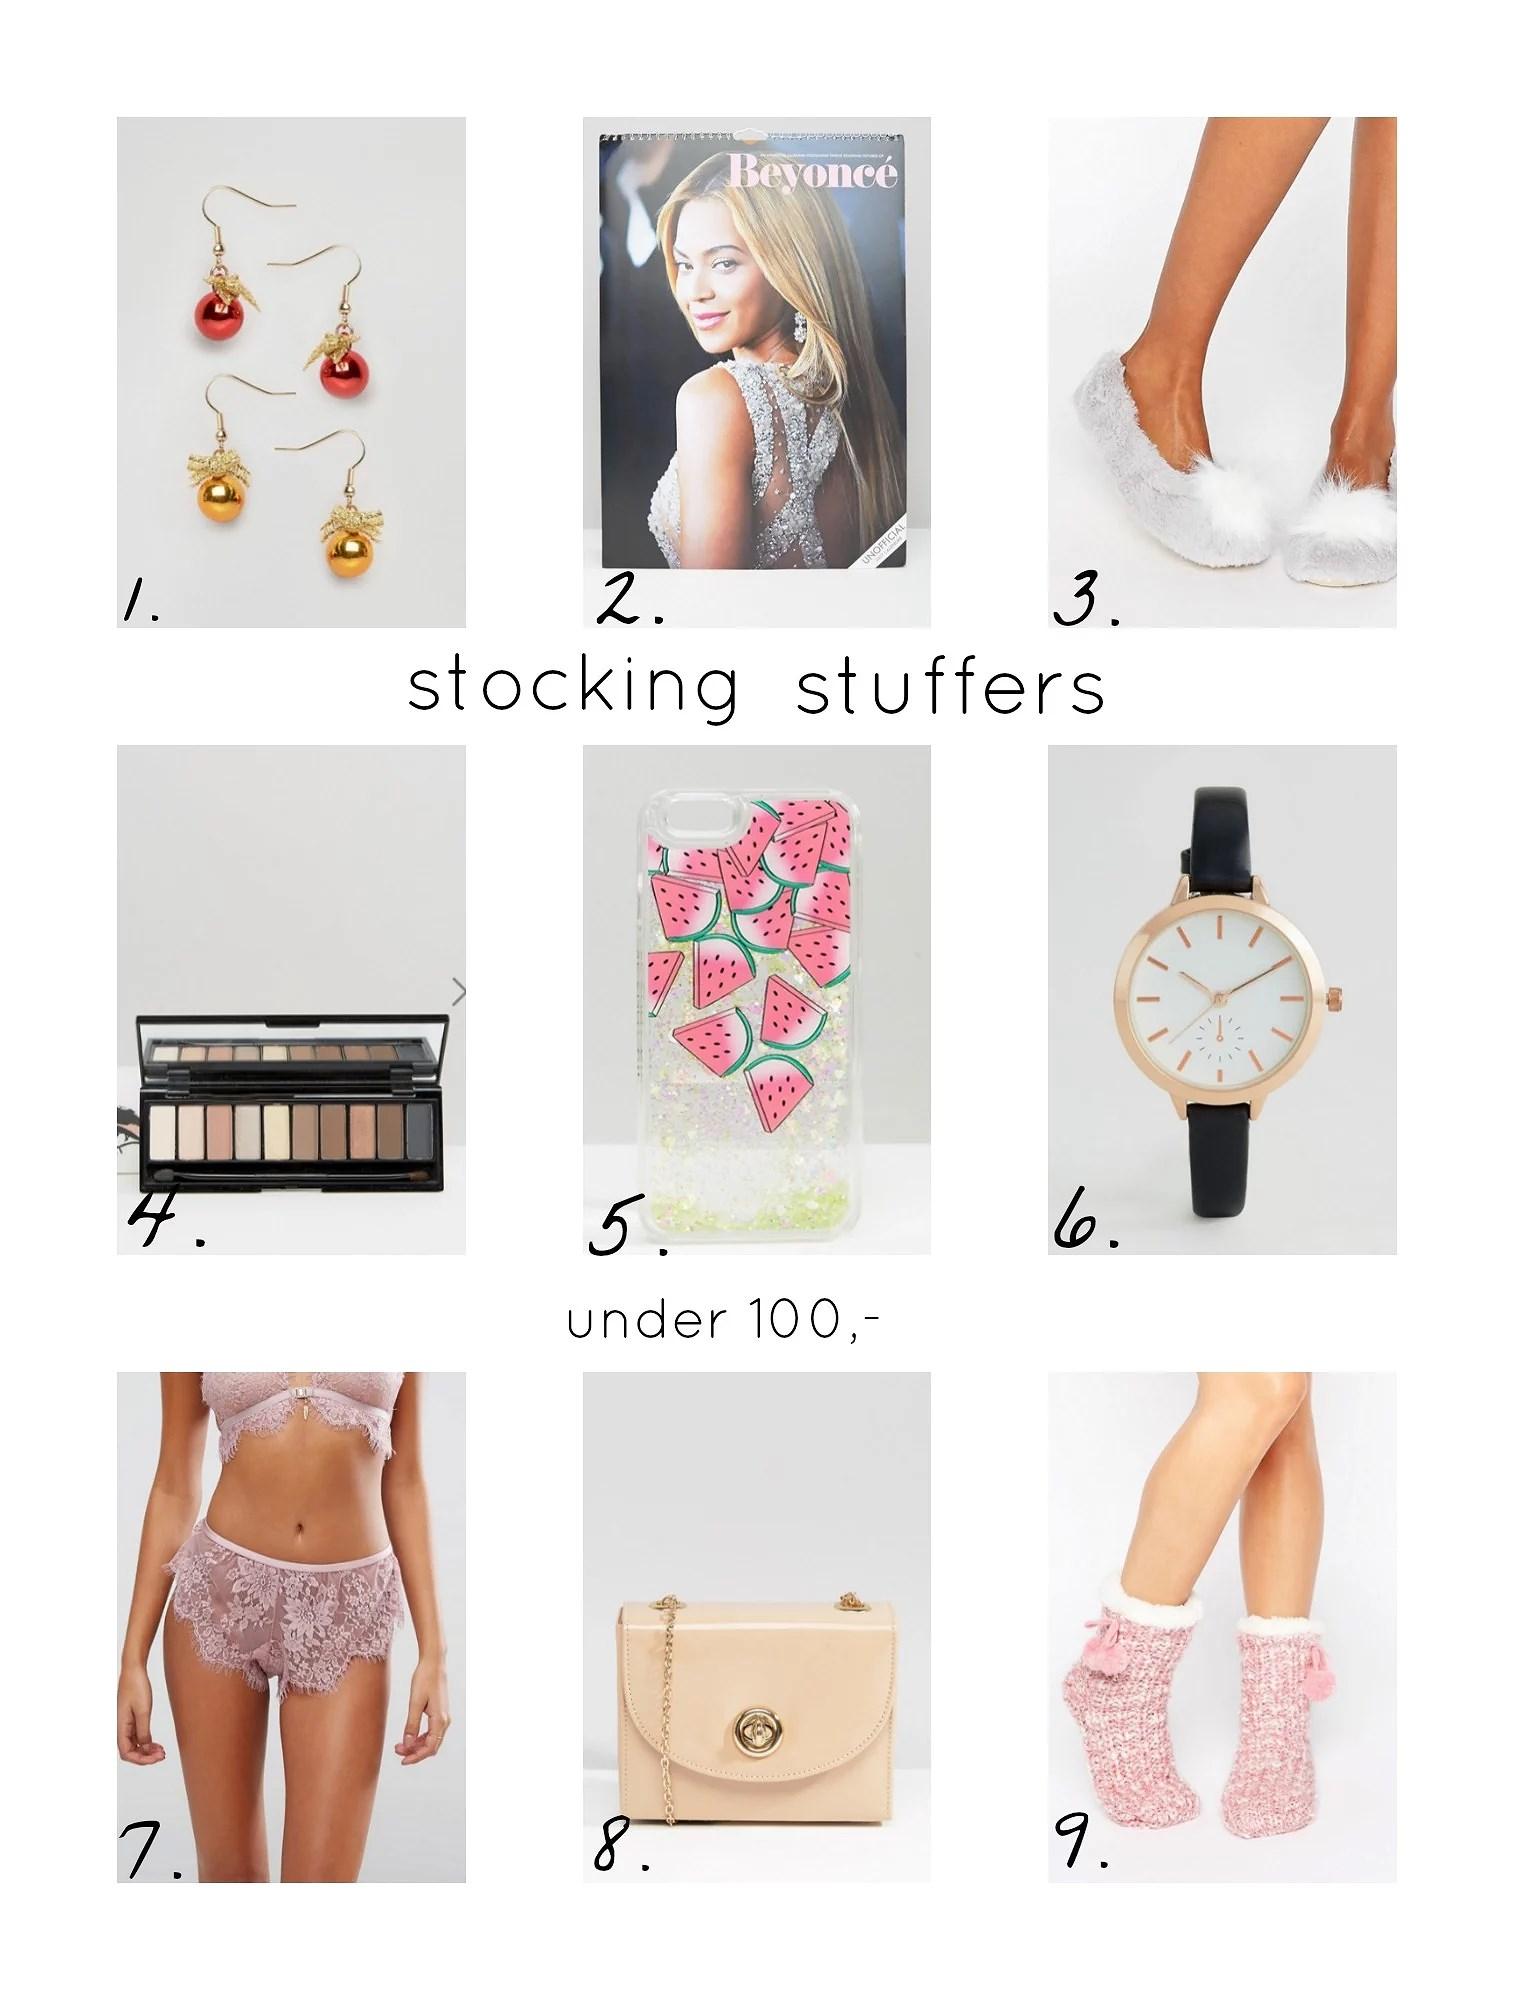 Stocking Stuffers - gaver under 100,-